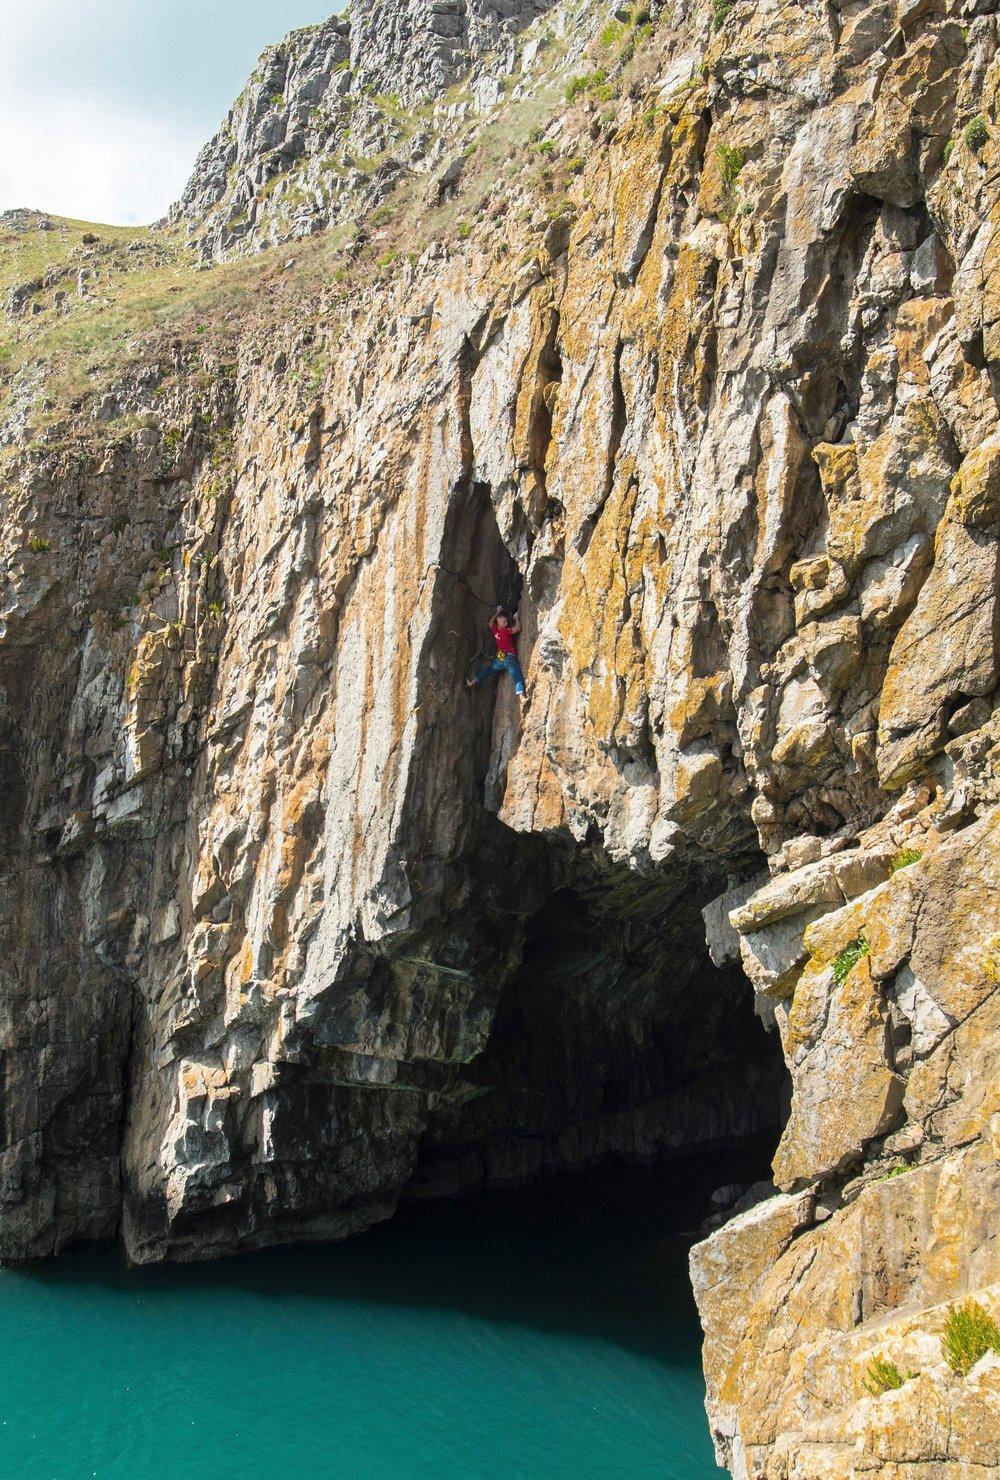 The Abyss 7b S3, Pembroke, UK. Second ascent in 2014.  Photo: Wojtek Kozakeiwicz / LW Images